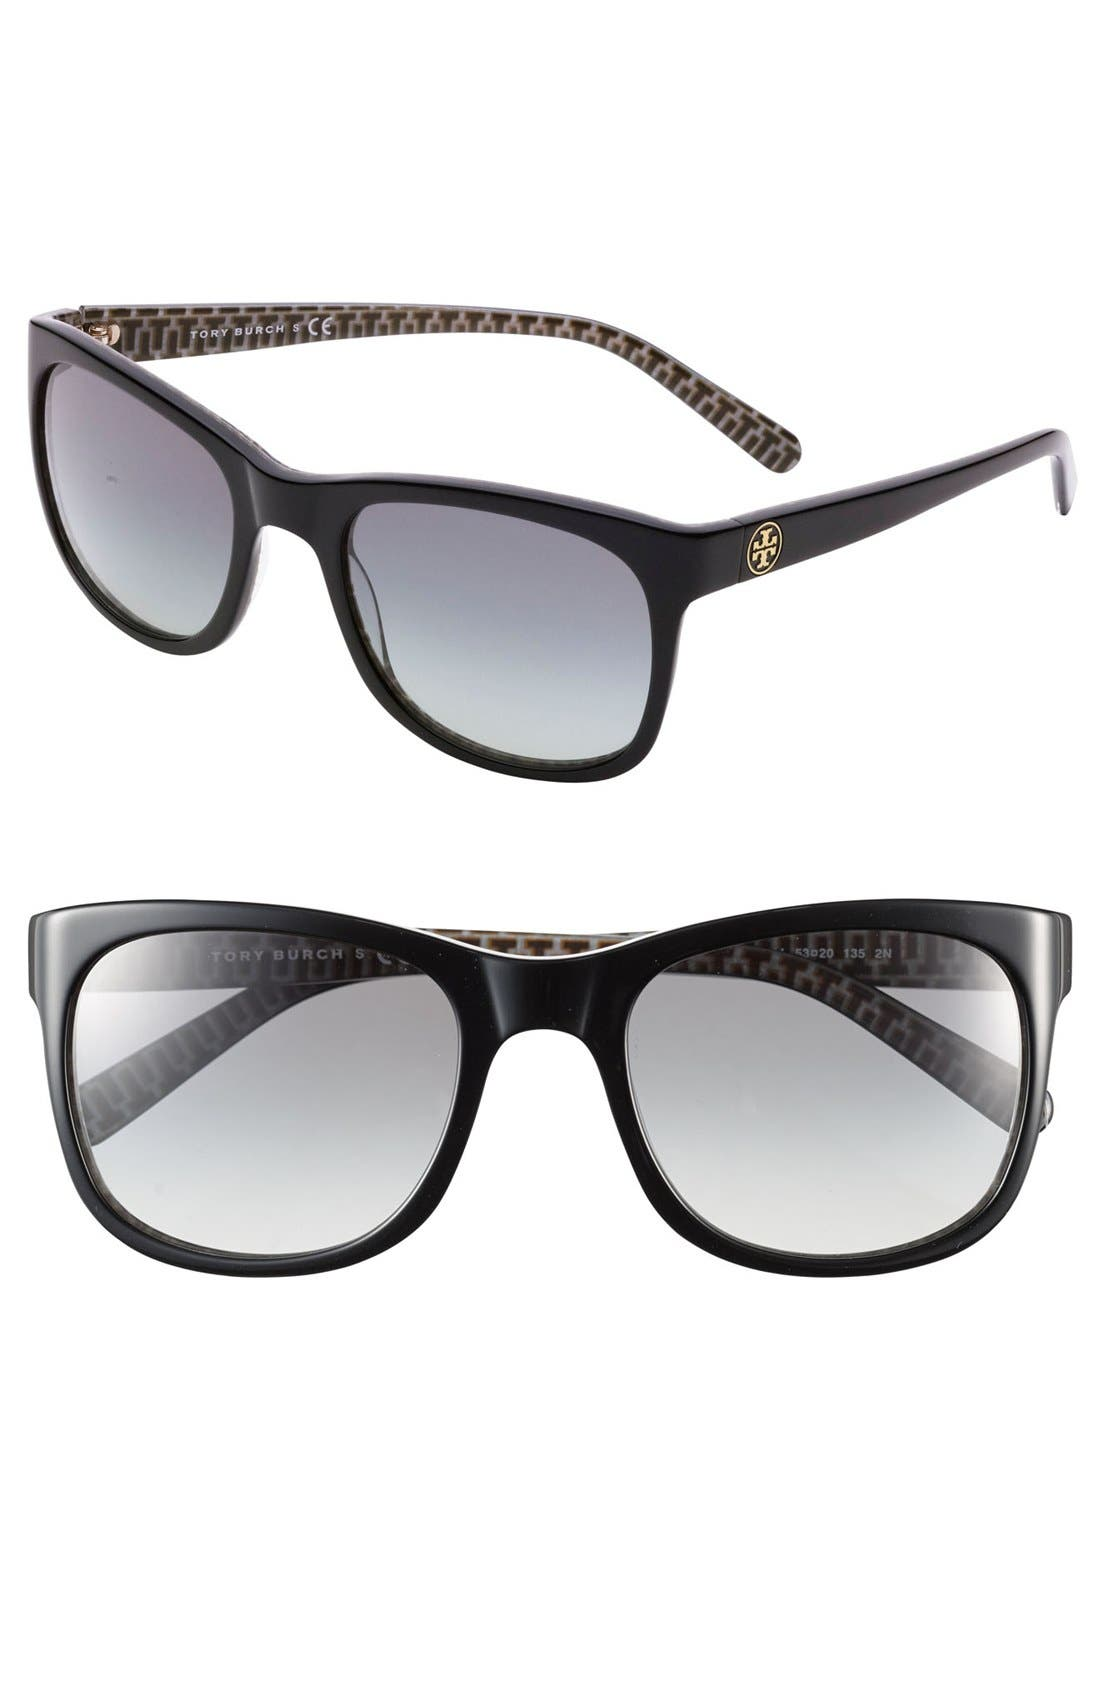 Alternate Image 1 Selected - Tory Burch 53mm Glam Logo Sunglasses